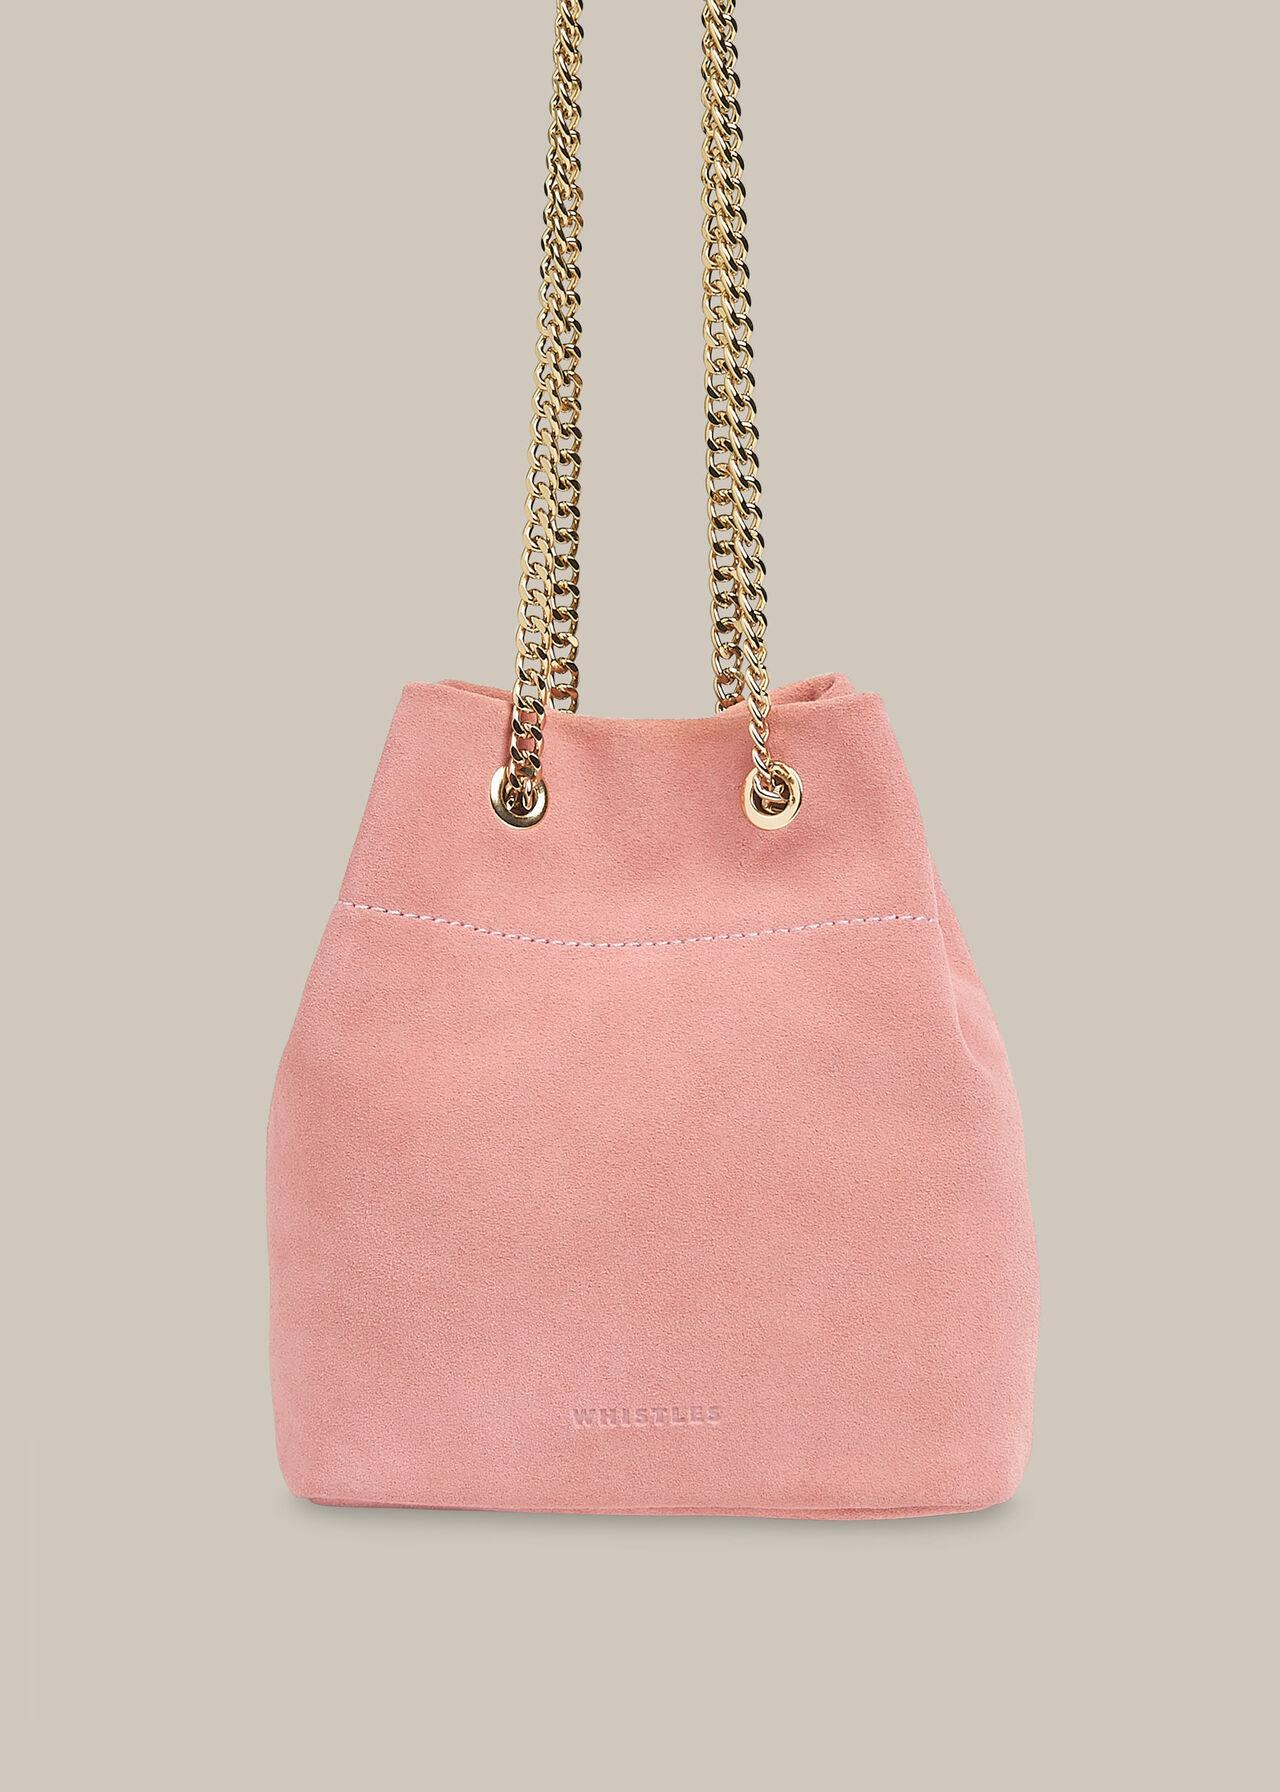 Ivy Chain Drawstring Bag Pink